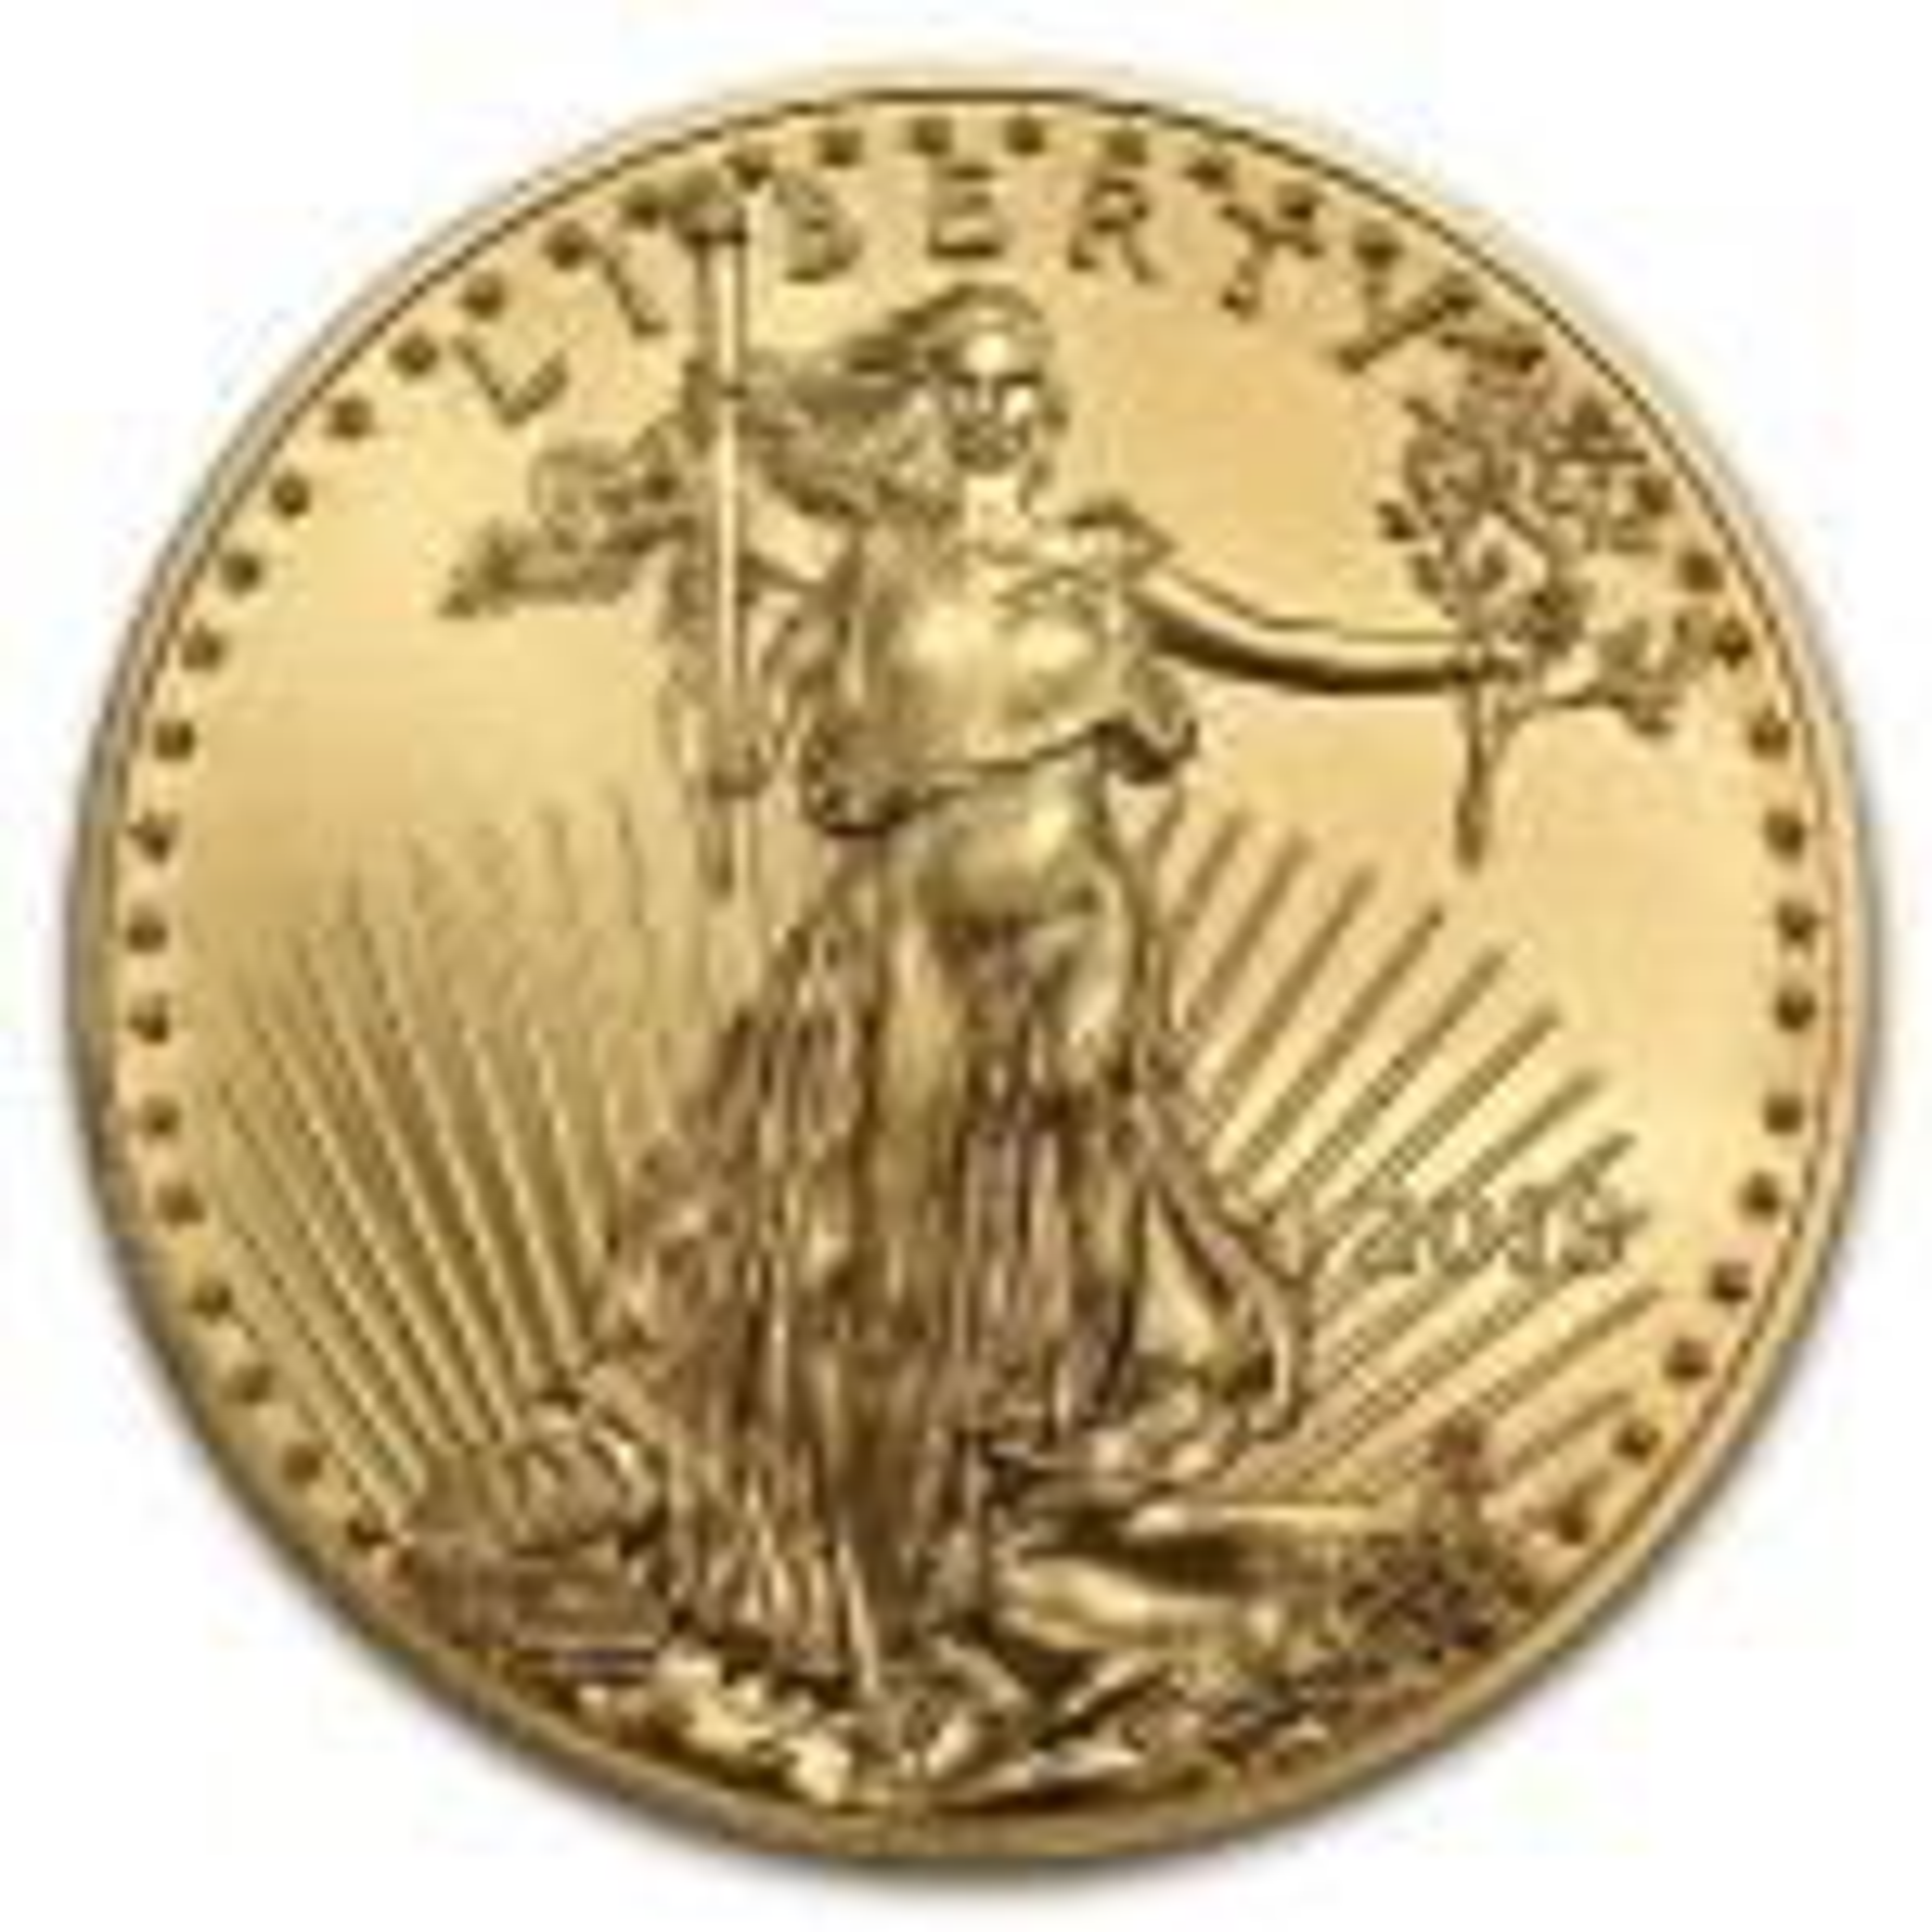 Gold Eagle 1/2 troy ounce coin 2020